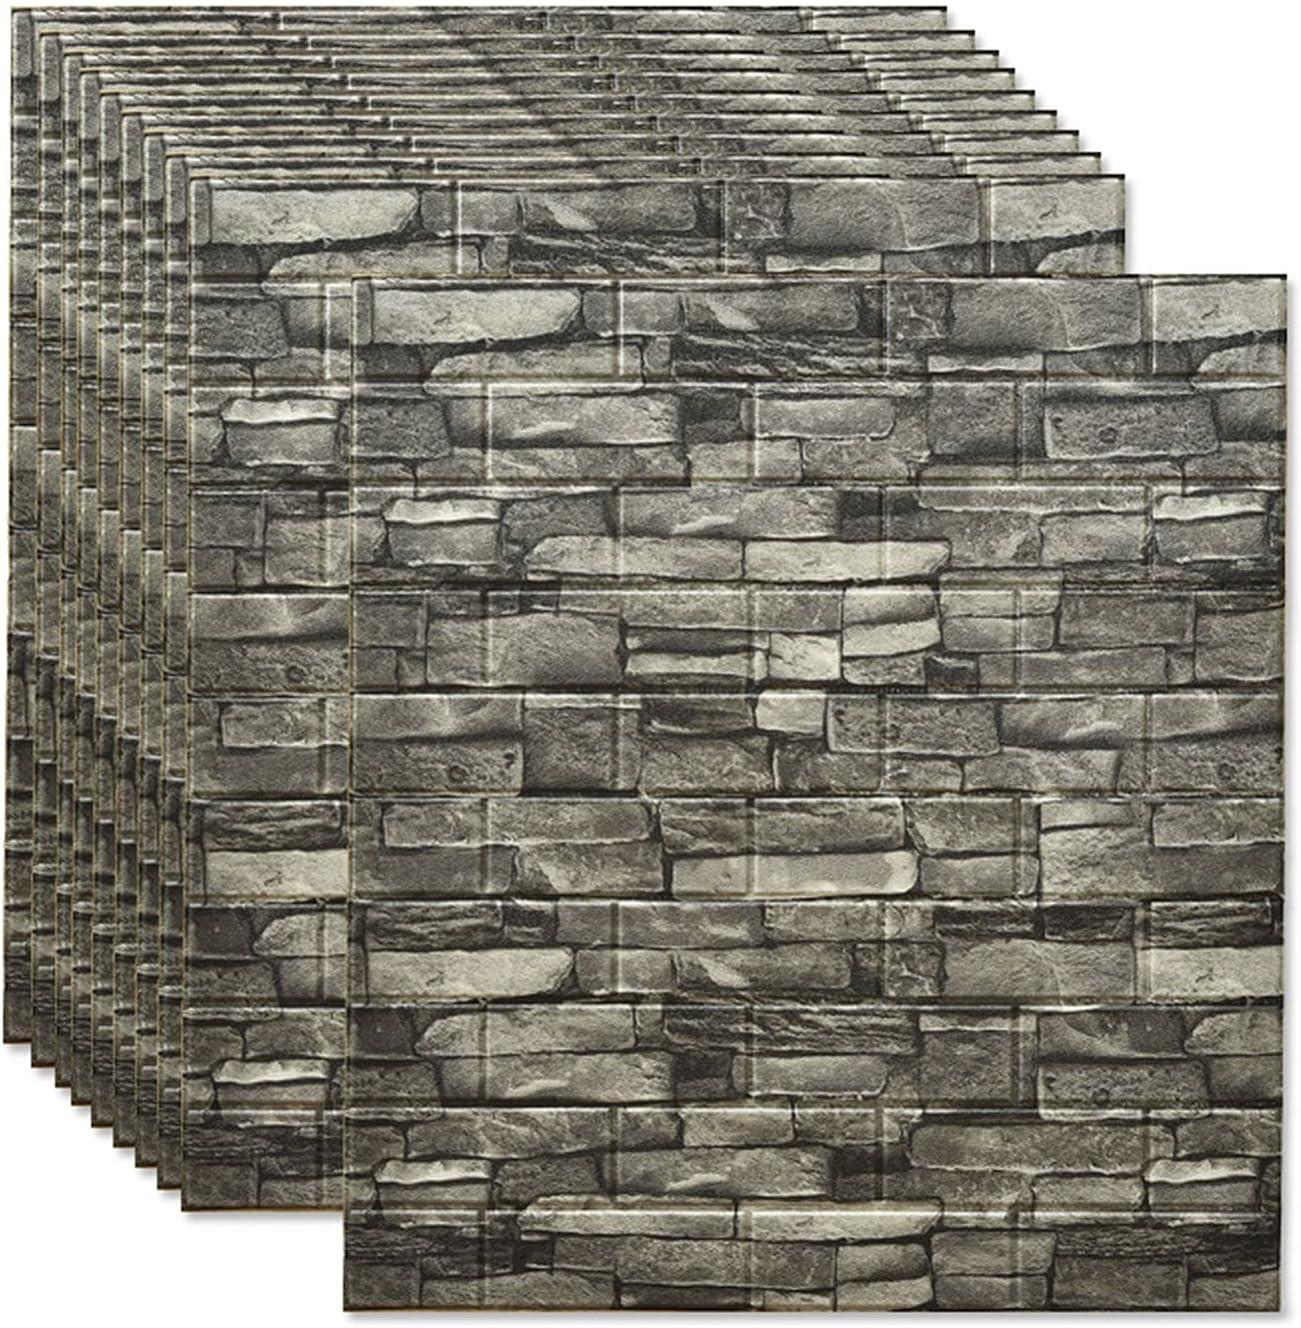 DLMSDG Super intense SALE Brick Wall Outlet sale feature Stickers Self-Adhesive Foam Wallpaper Waterpr